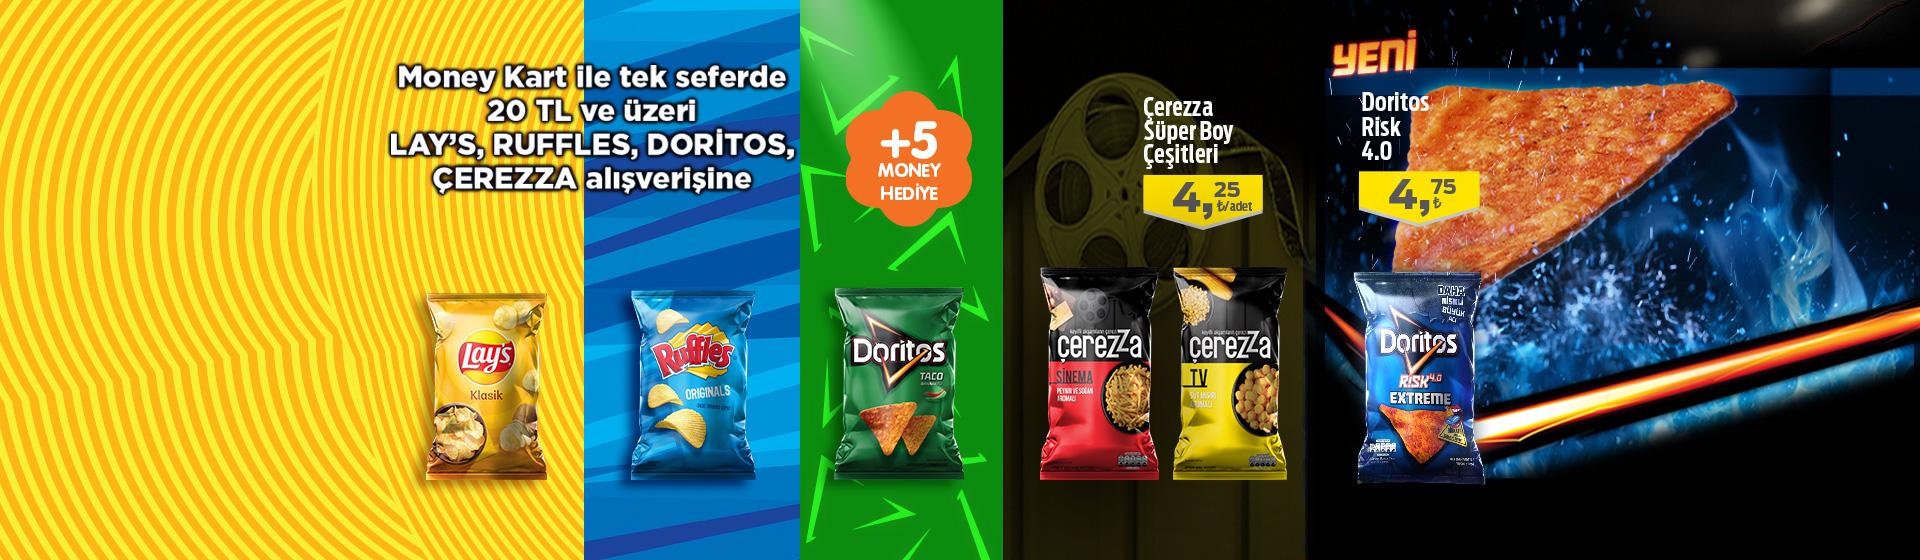 Lays Ruffles Doritos Money Kampanyası